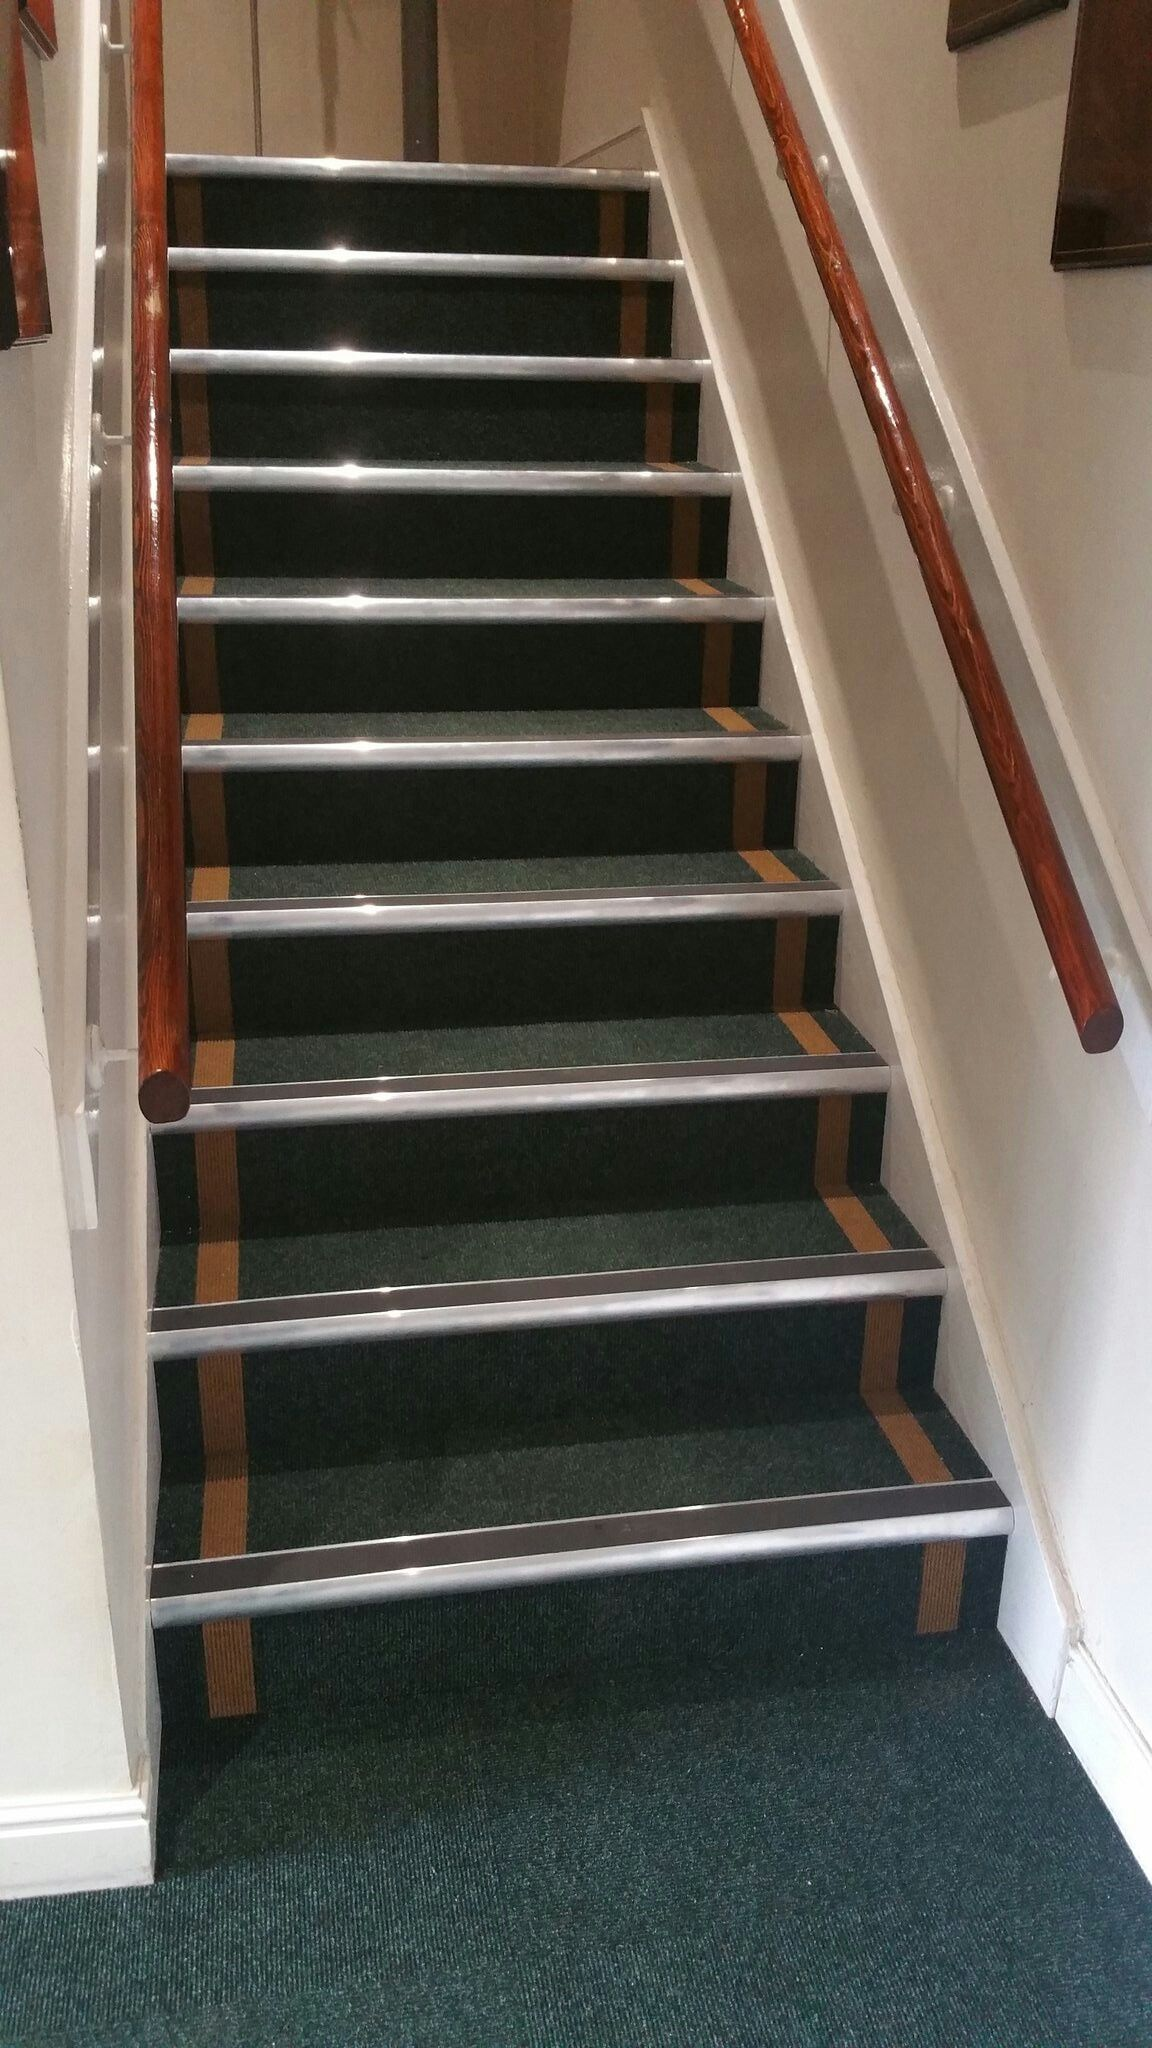 Genial Stair Carpet Runner, Carpet Stairs, Carpet Repair, Carpets, Runners, Atlanta,  Farmhouse Rugs, Hallways, Rugs, Carpet, Joggers, Stair Runners